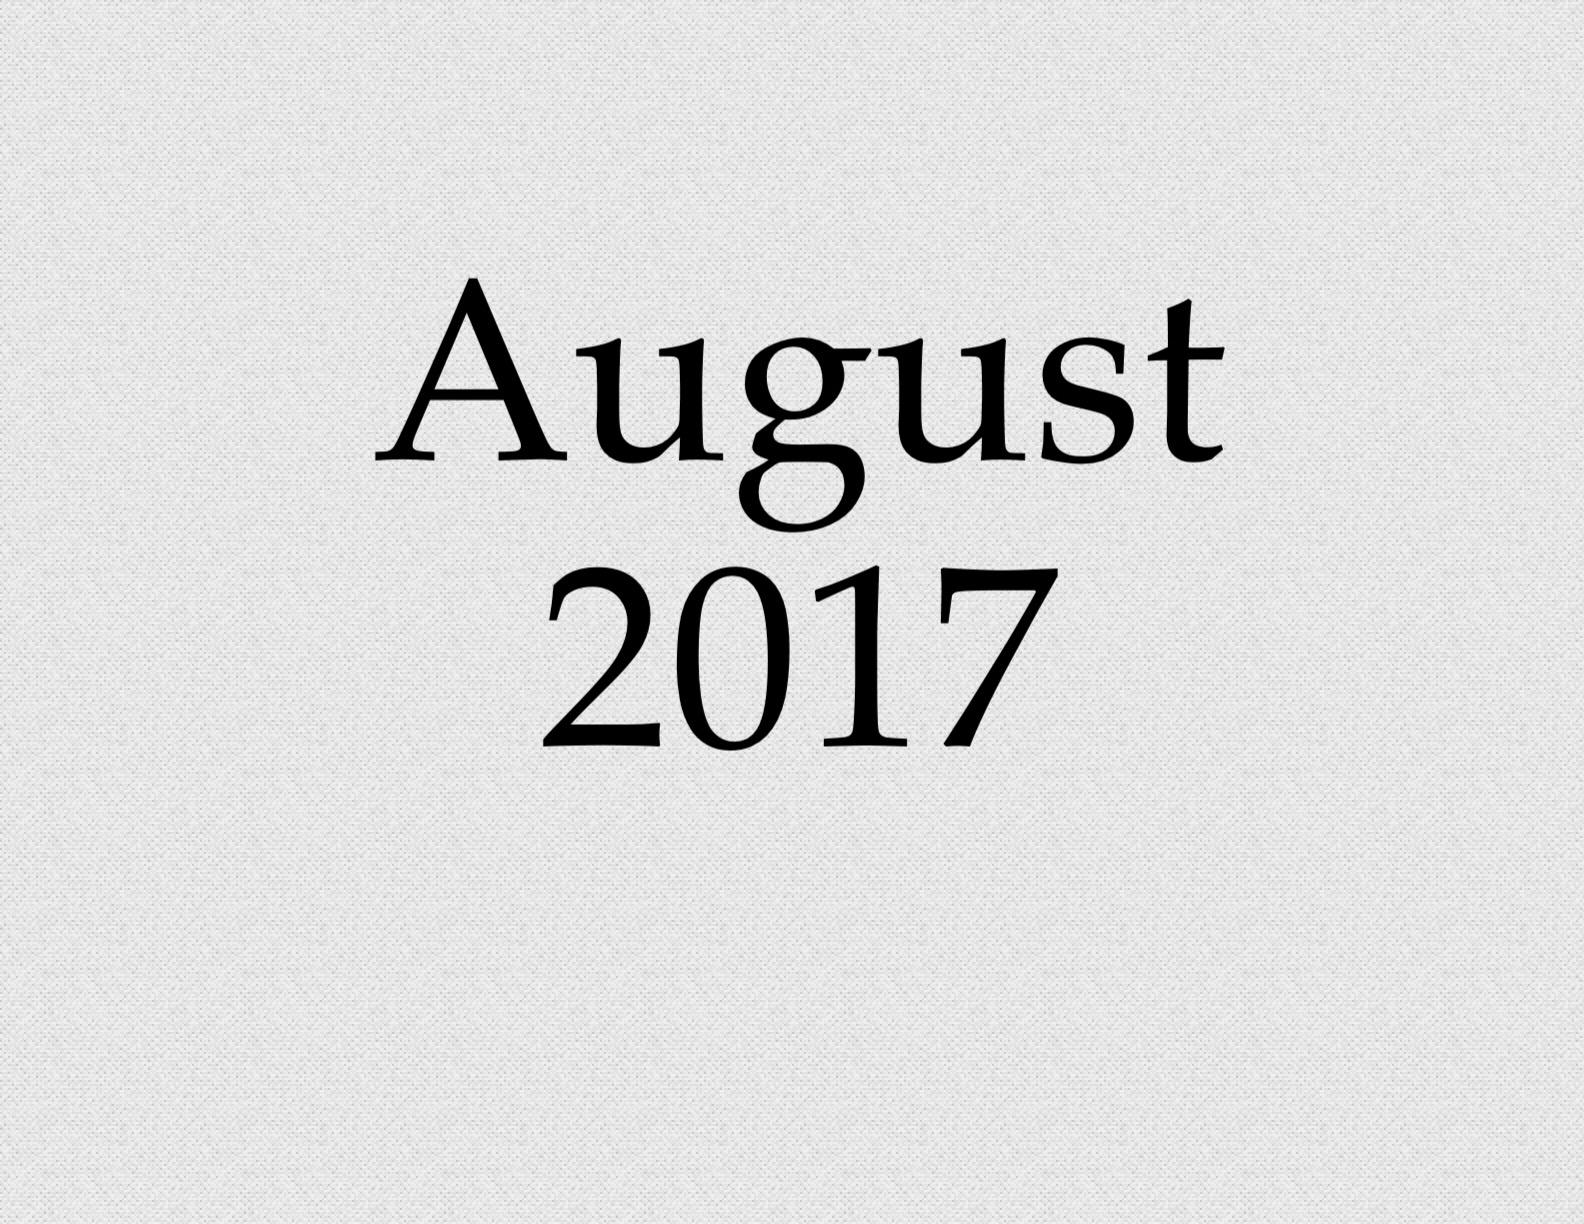 Photo Aug 01, 1 28 33 PM.jpg